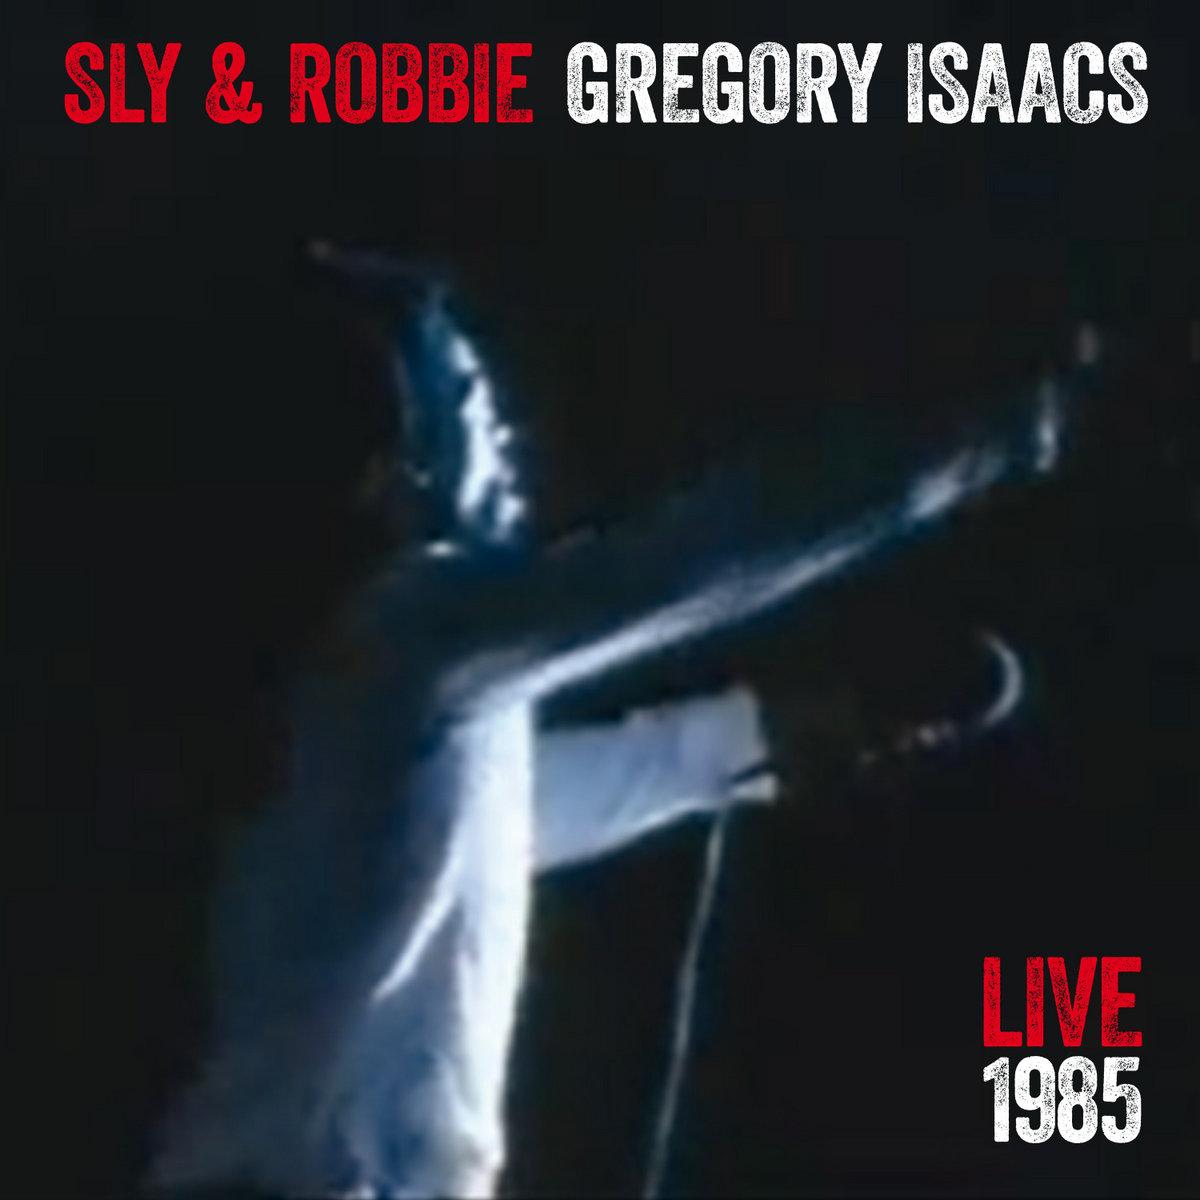 CD GREGORY ISAACS MP3 BAIXAR